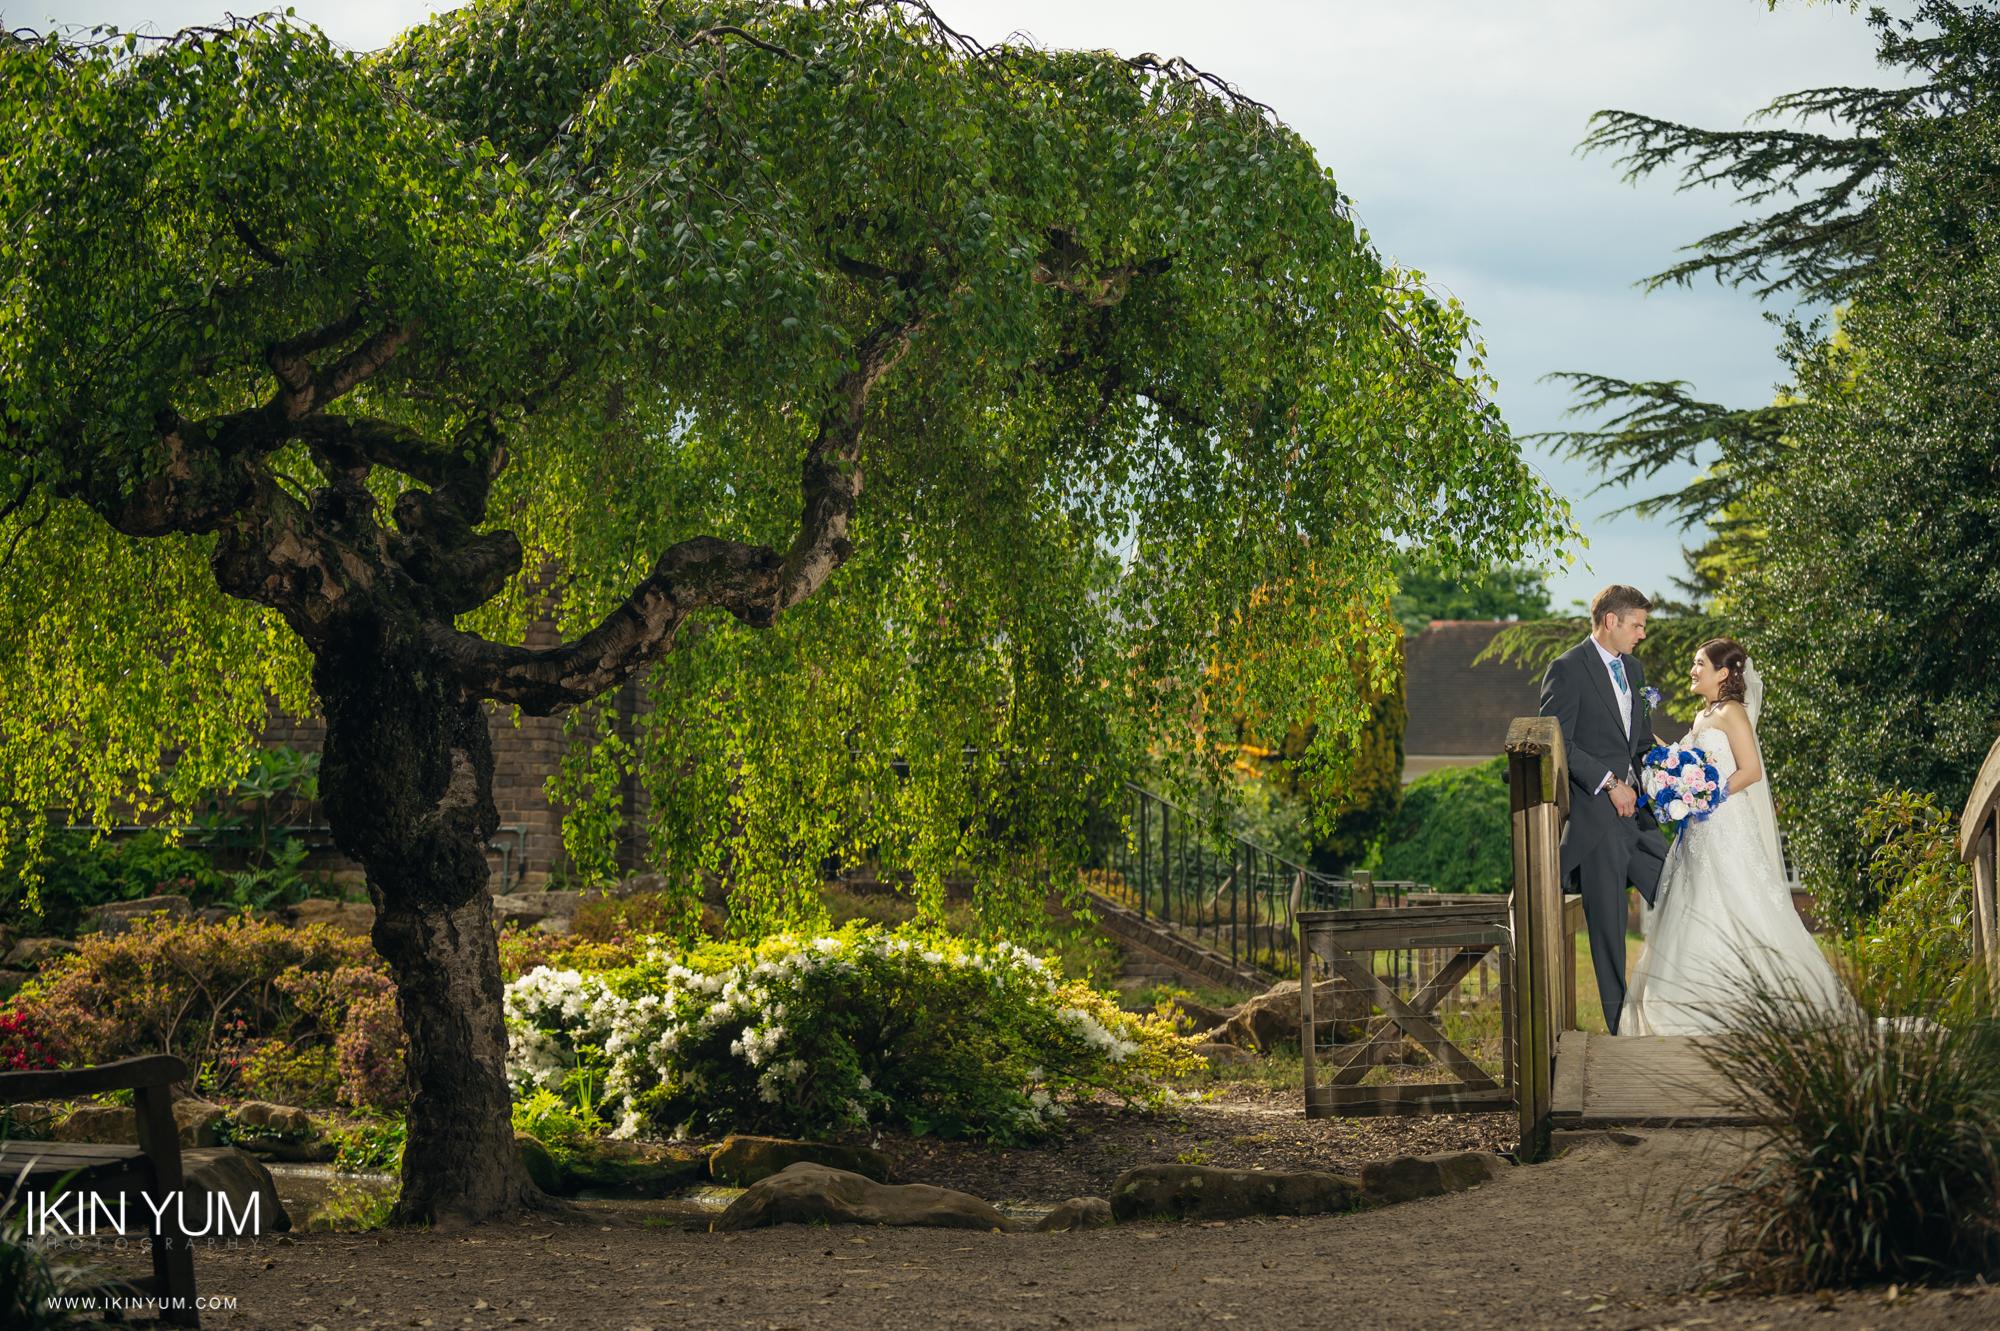 The Richmond Hill Hotel Wedding - Ikin Yum Photography